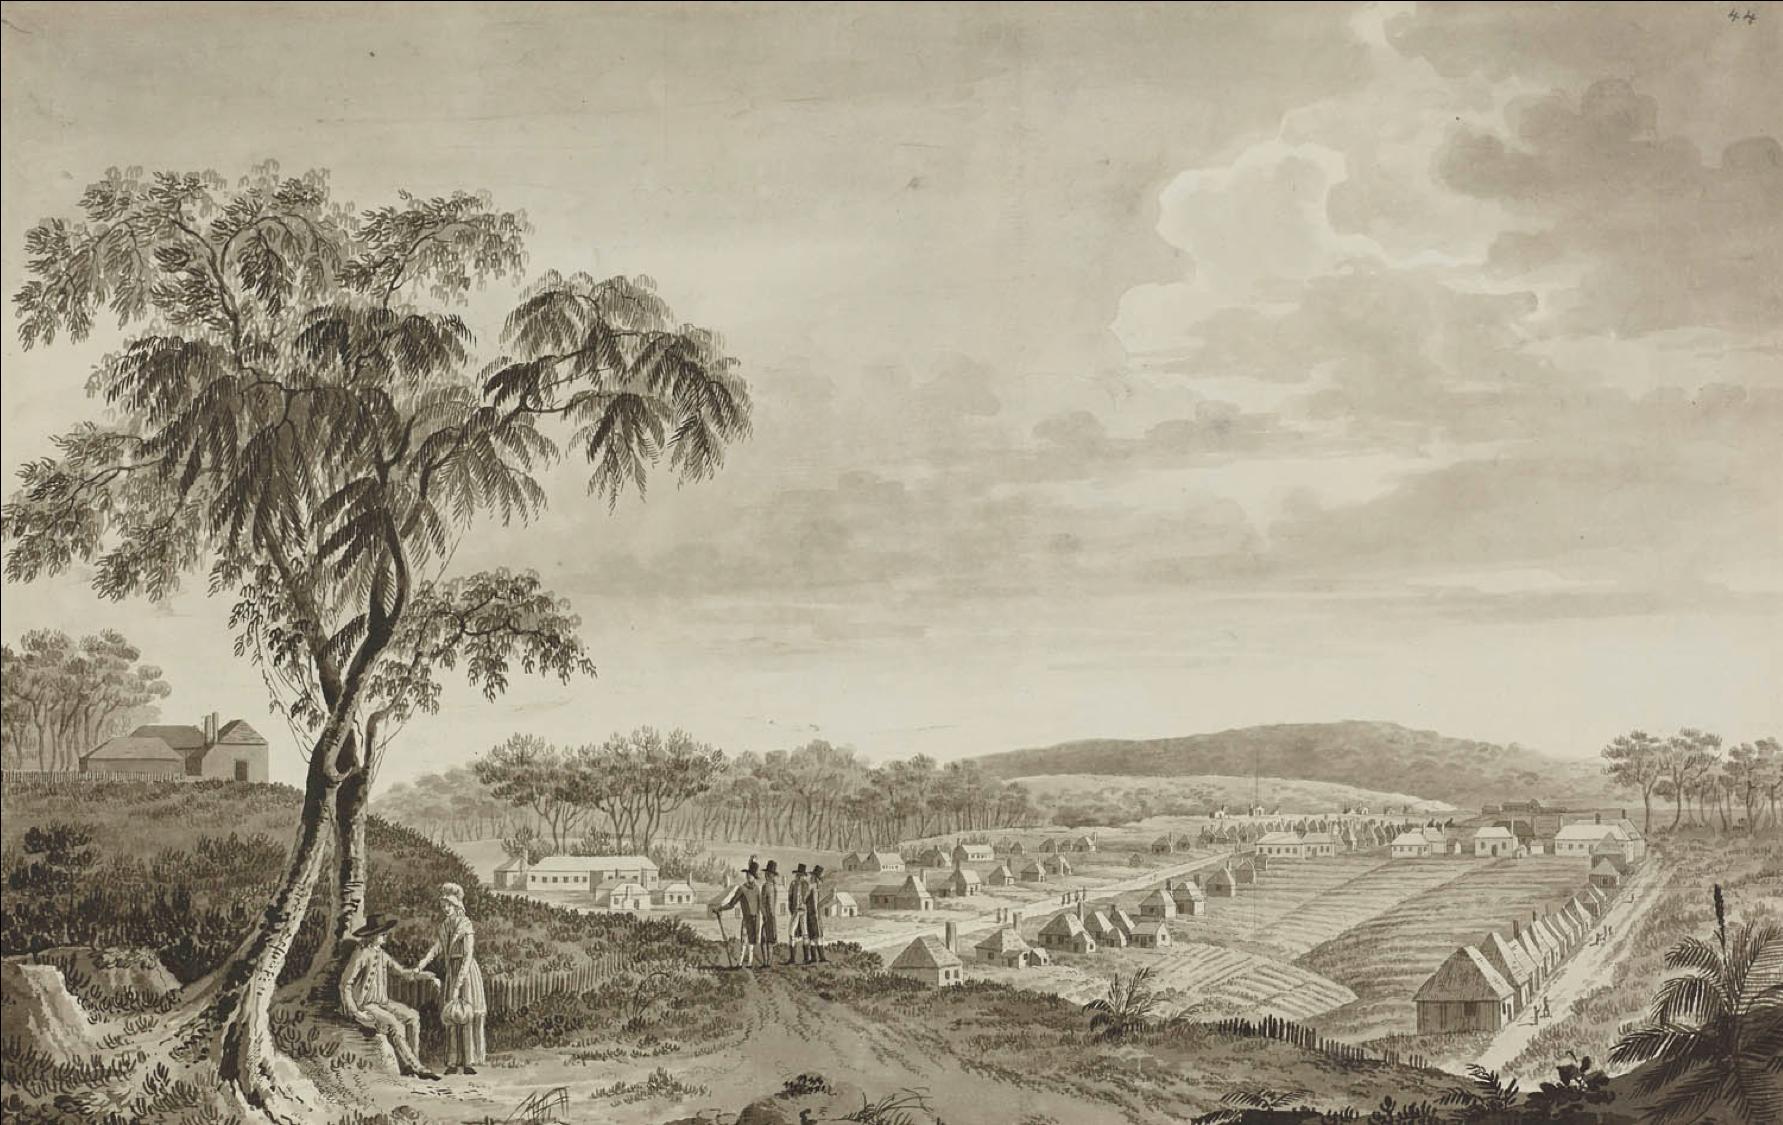 Fernando Brambila, Parramatta, April 1793, eighteenth-century Parramatta, eighteenth-century medicine, hospital, St. John's Cemetery Project, Old Parramattans, John Irving, Surgeon